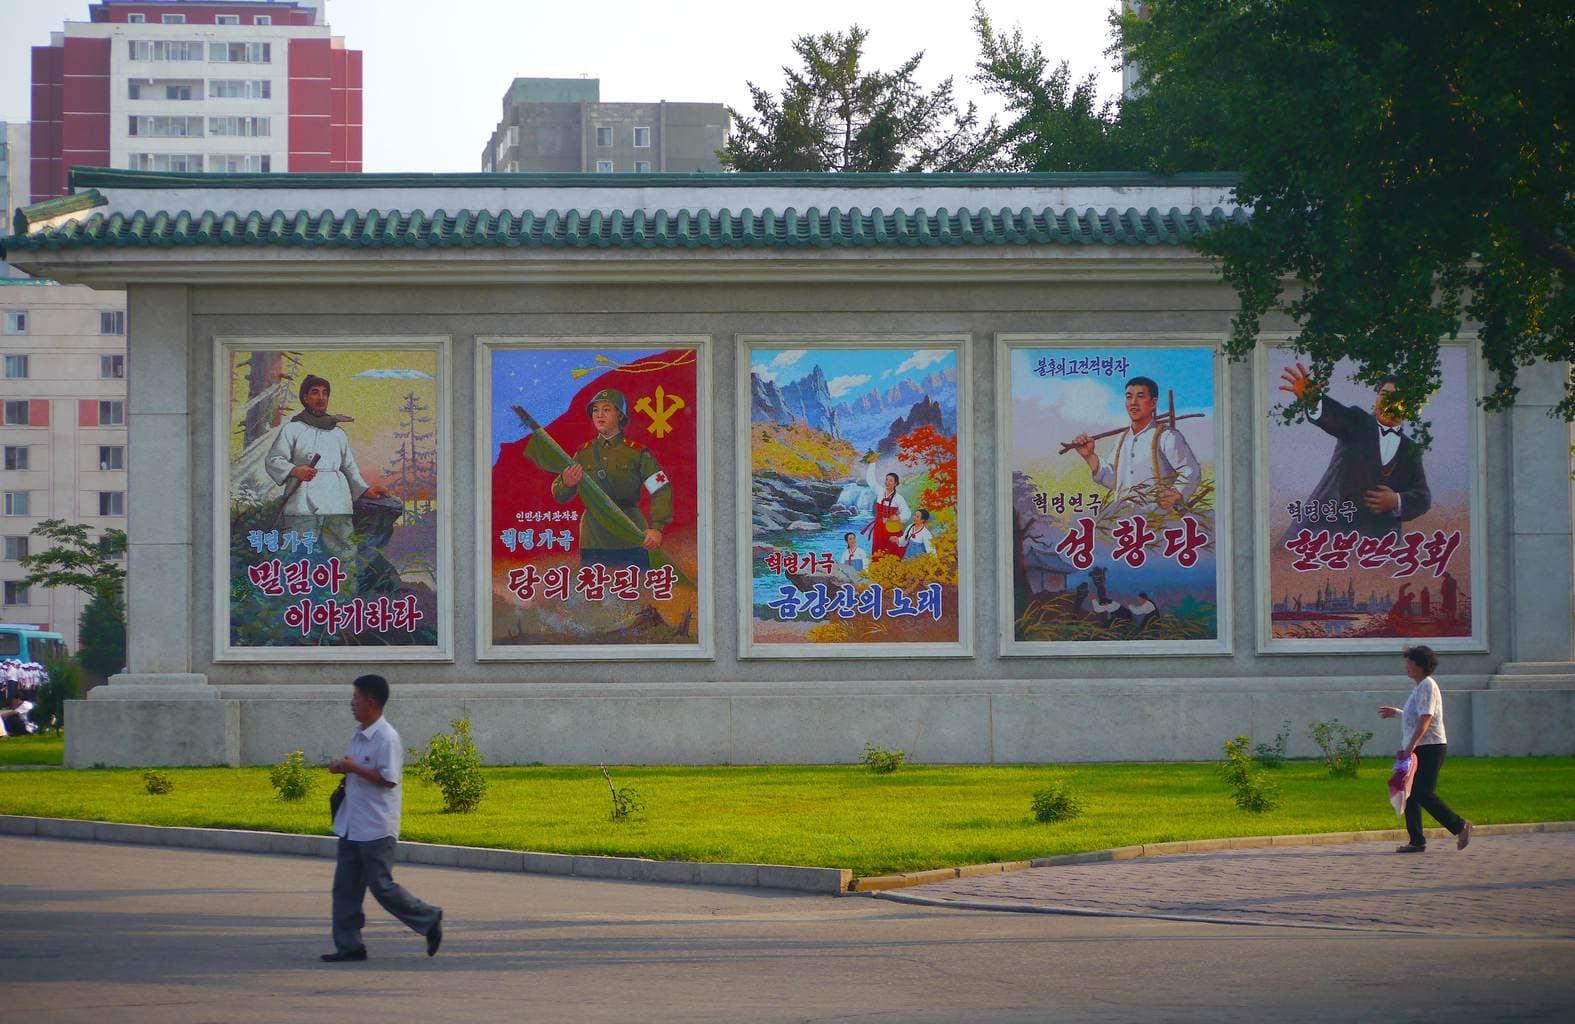 Trip to North Korea